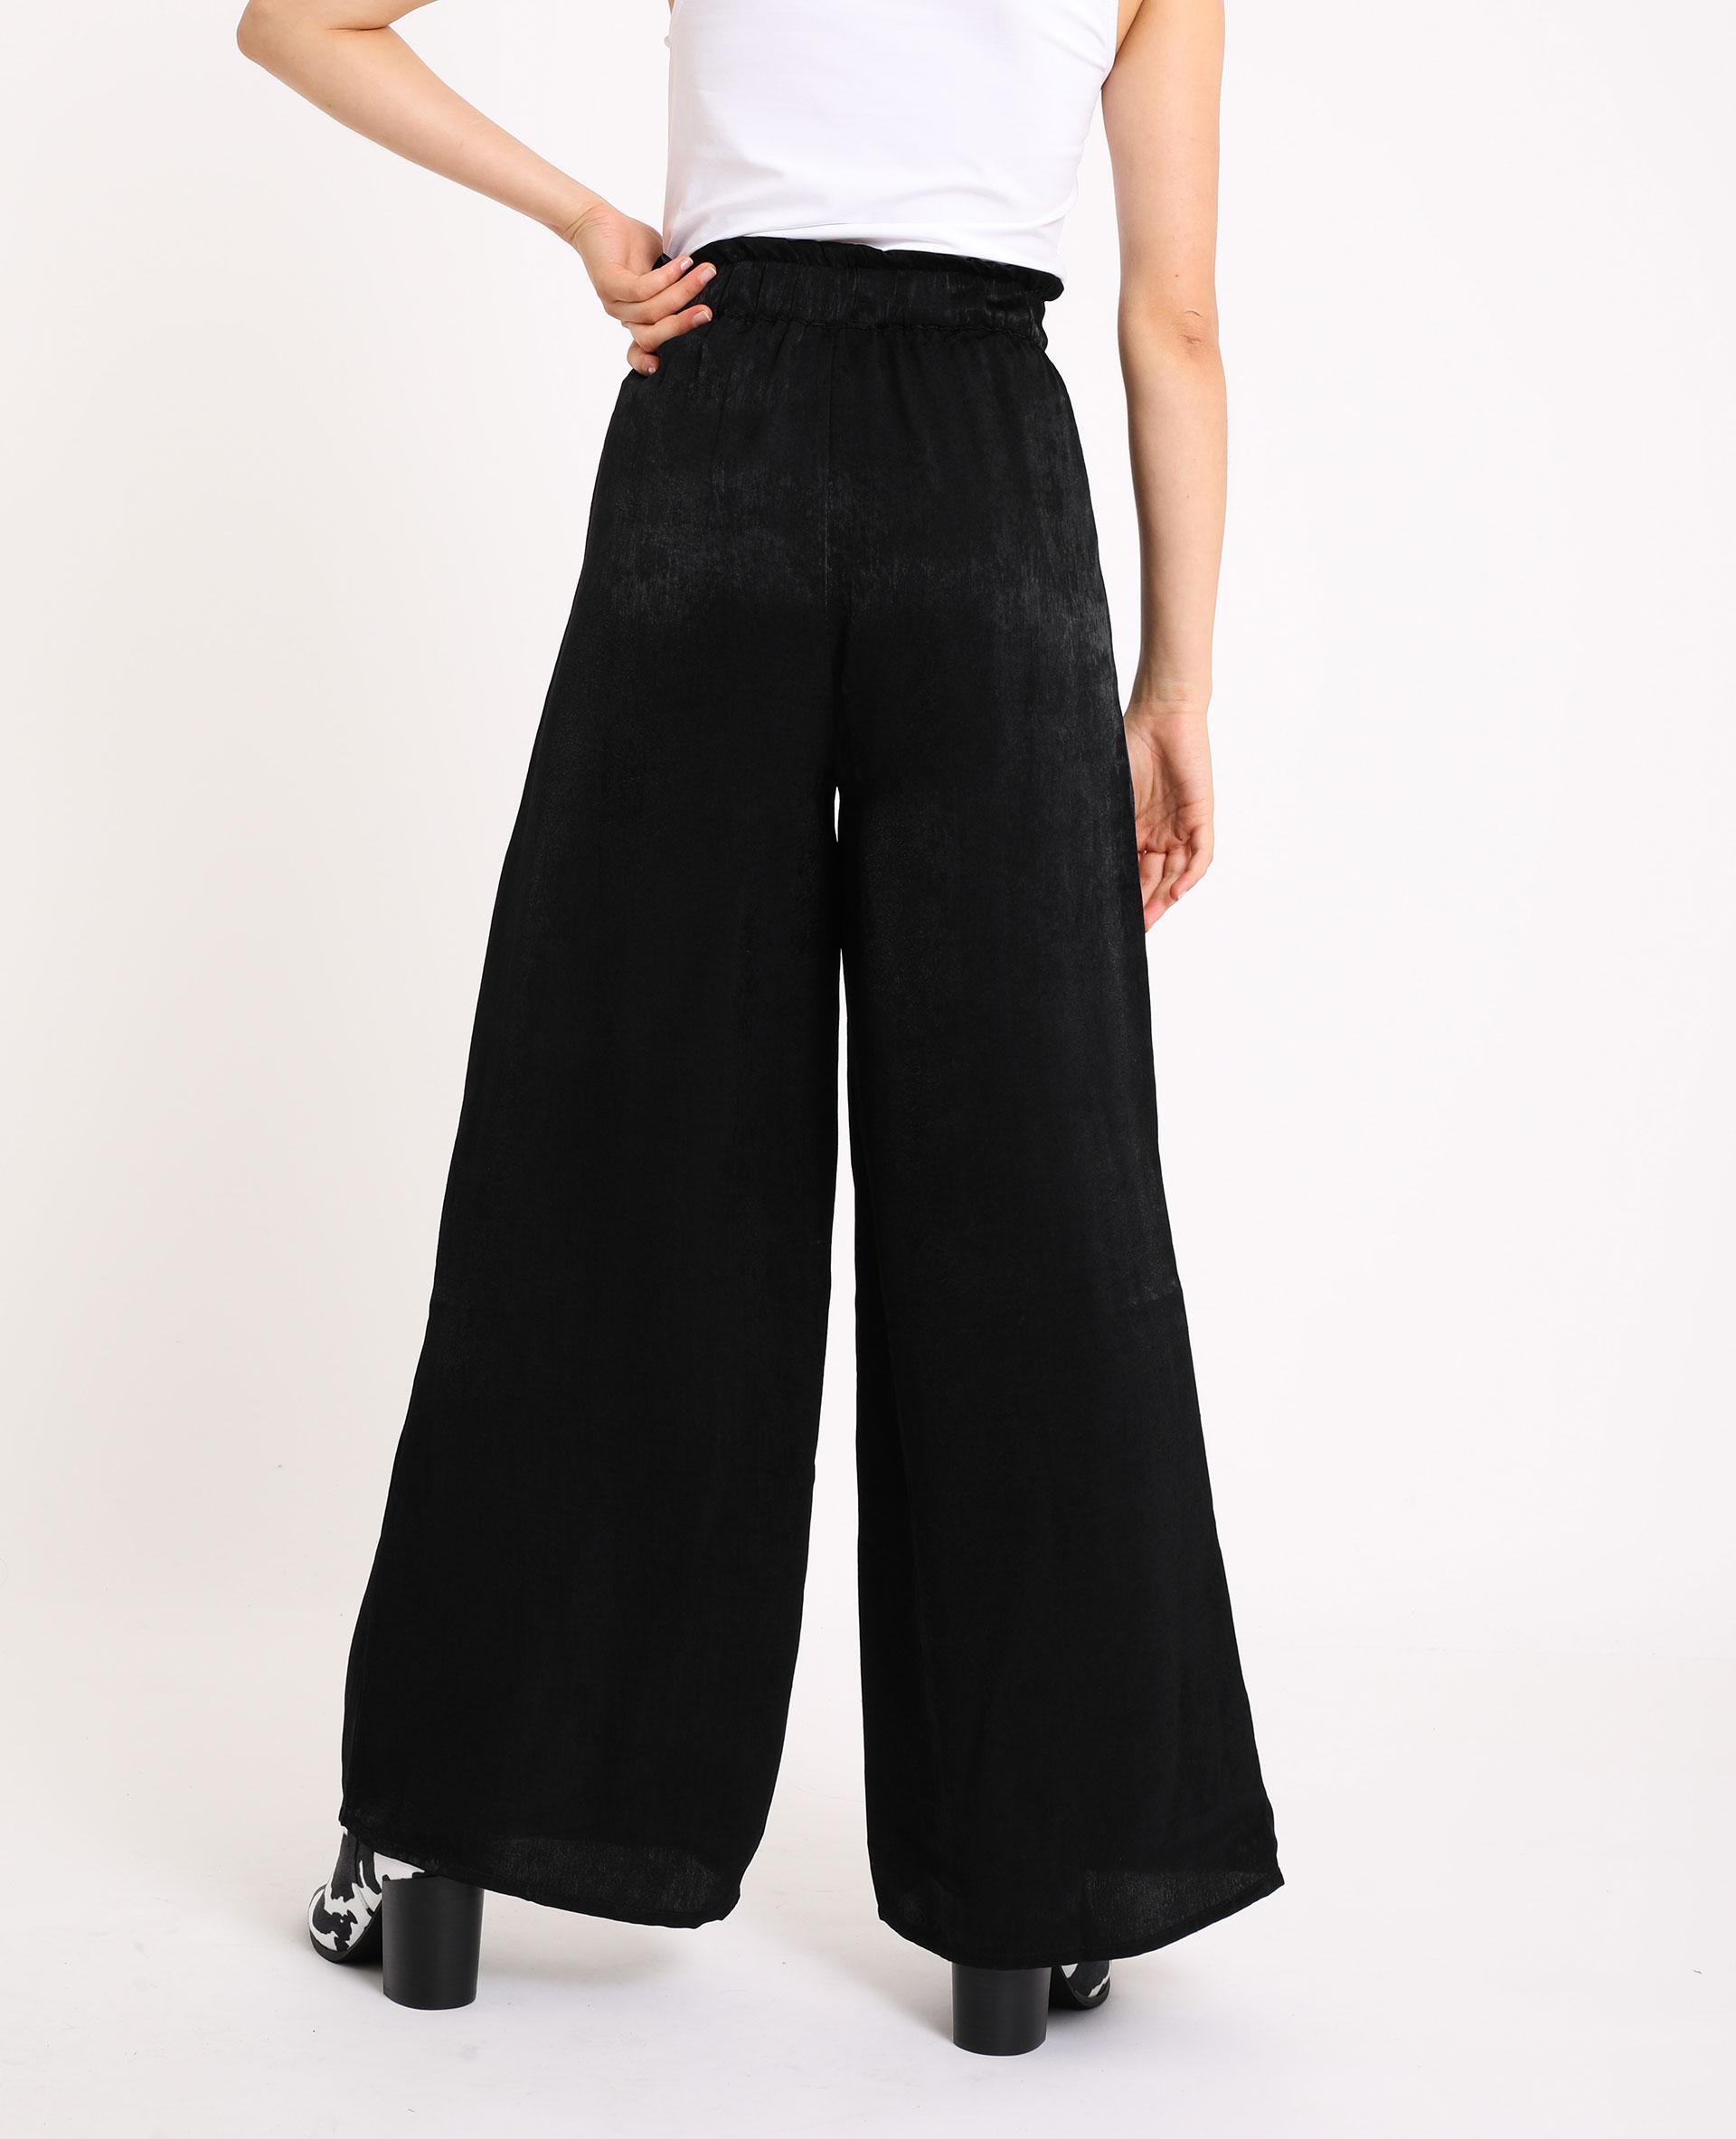 Pantalon large noir - Pimkie